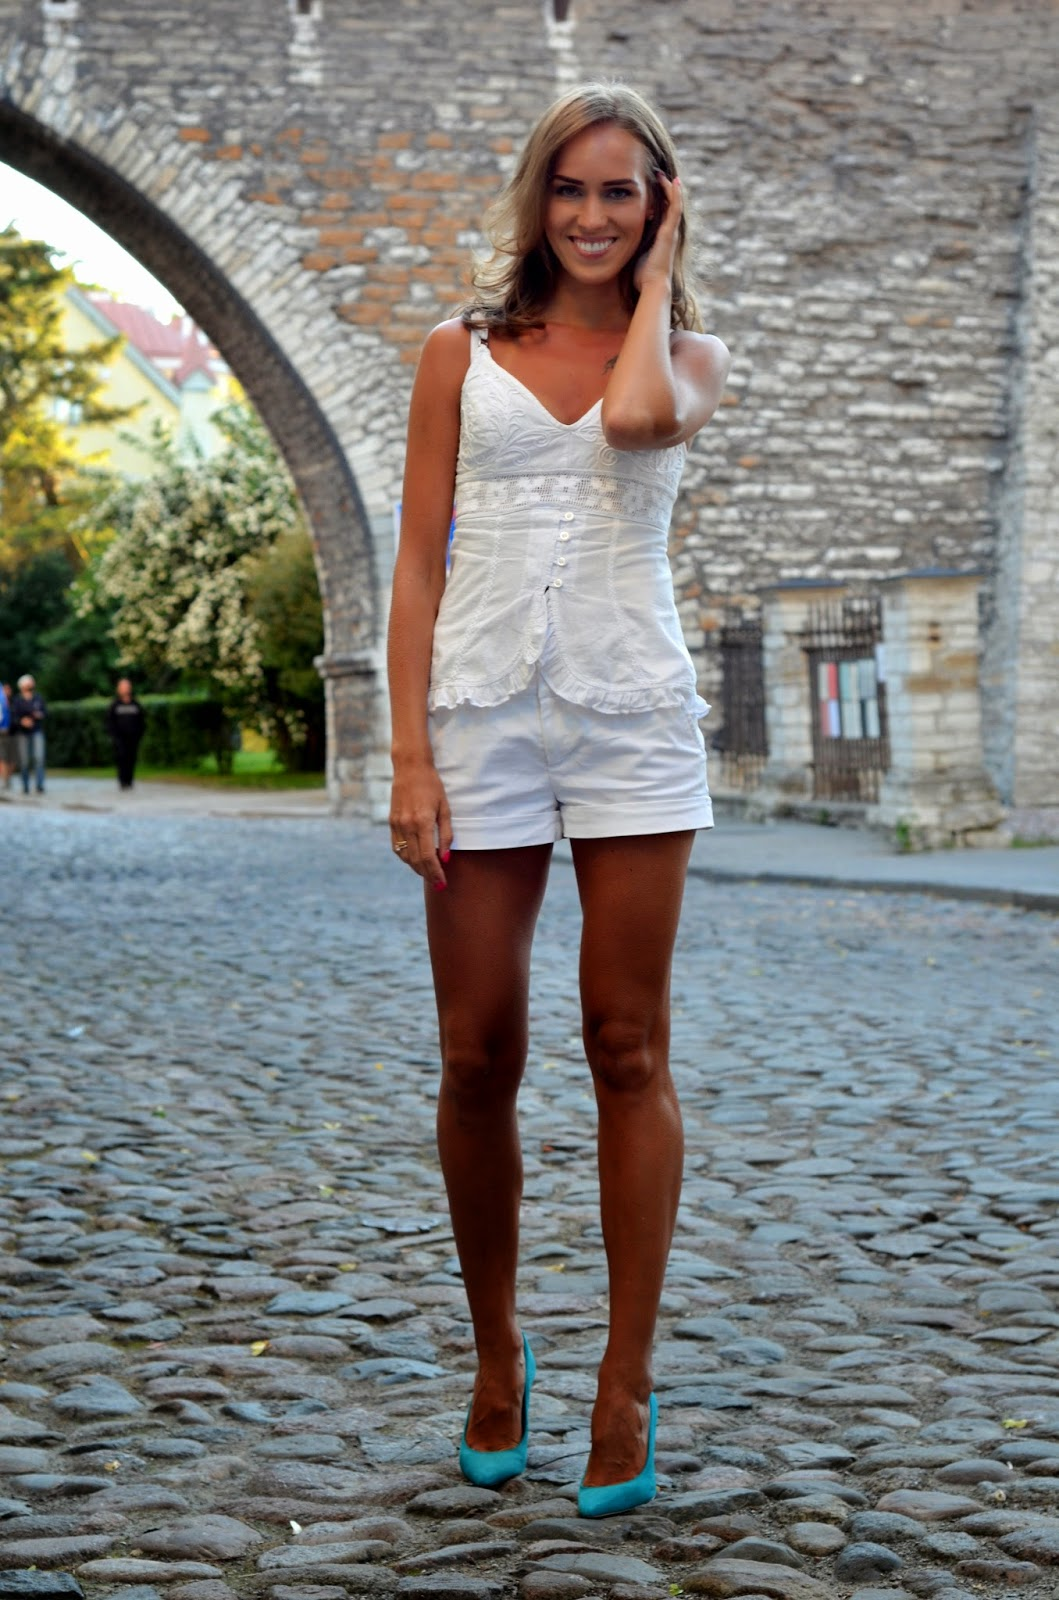 crochet top white shorts electric blue heels